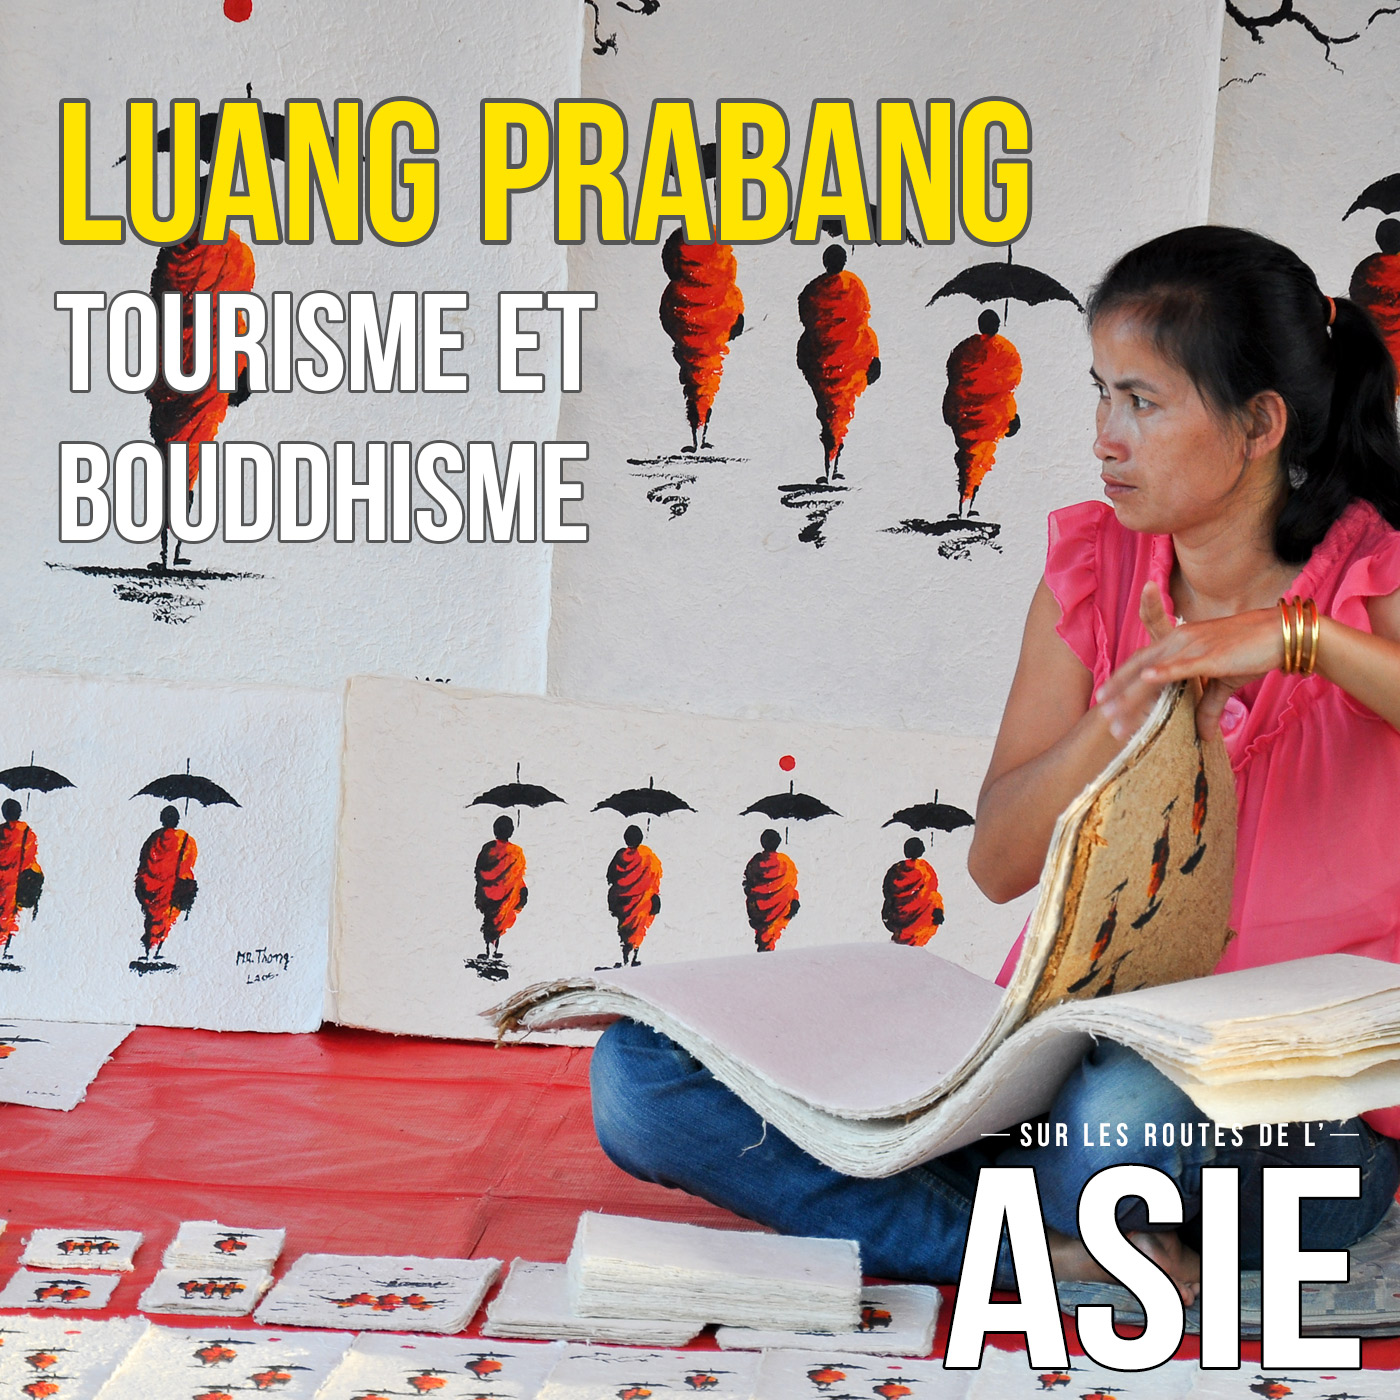 Luang Prabang : tourisme et bouddhisme (Laos)